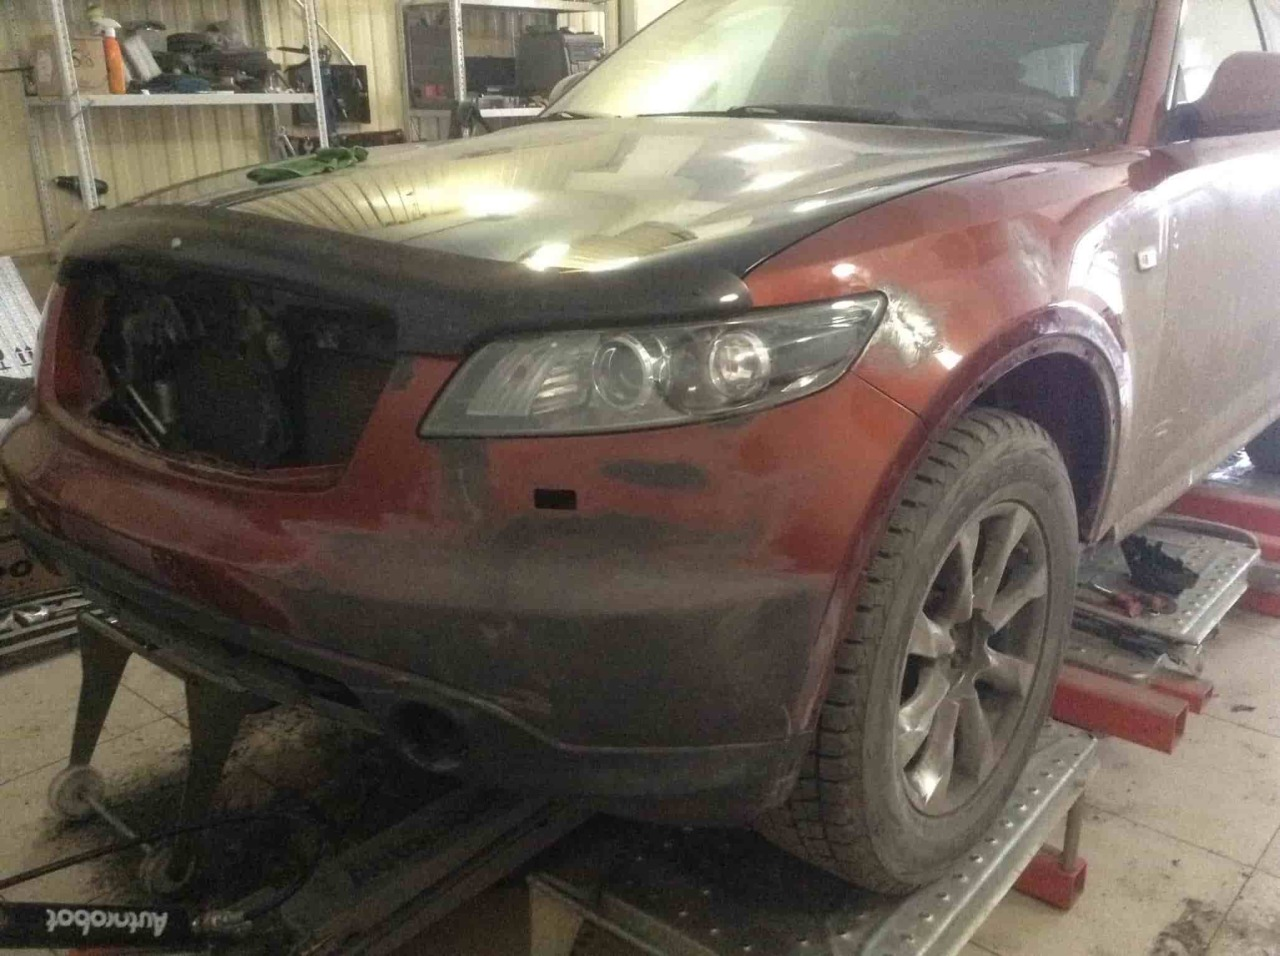 Фото авто до ремонта кузова